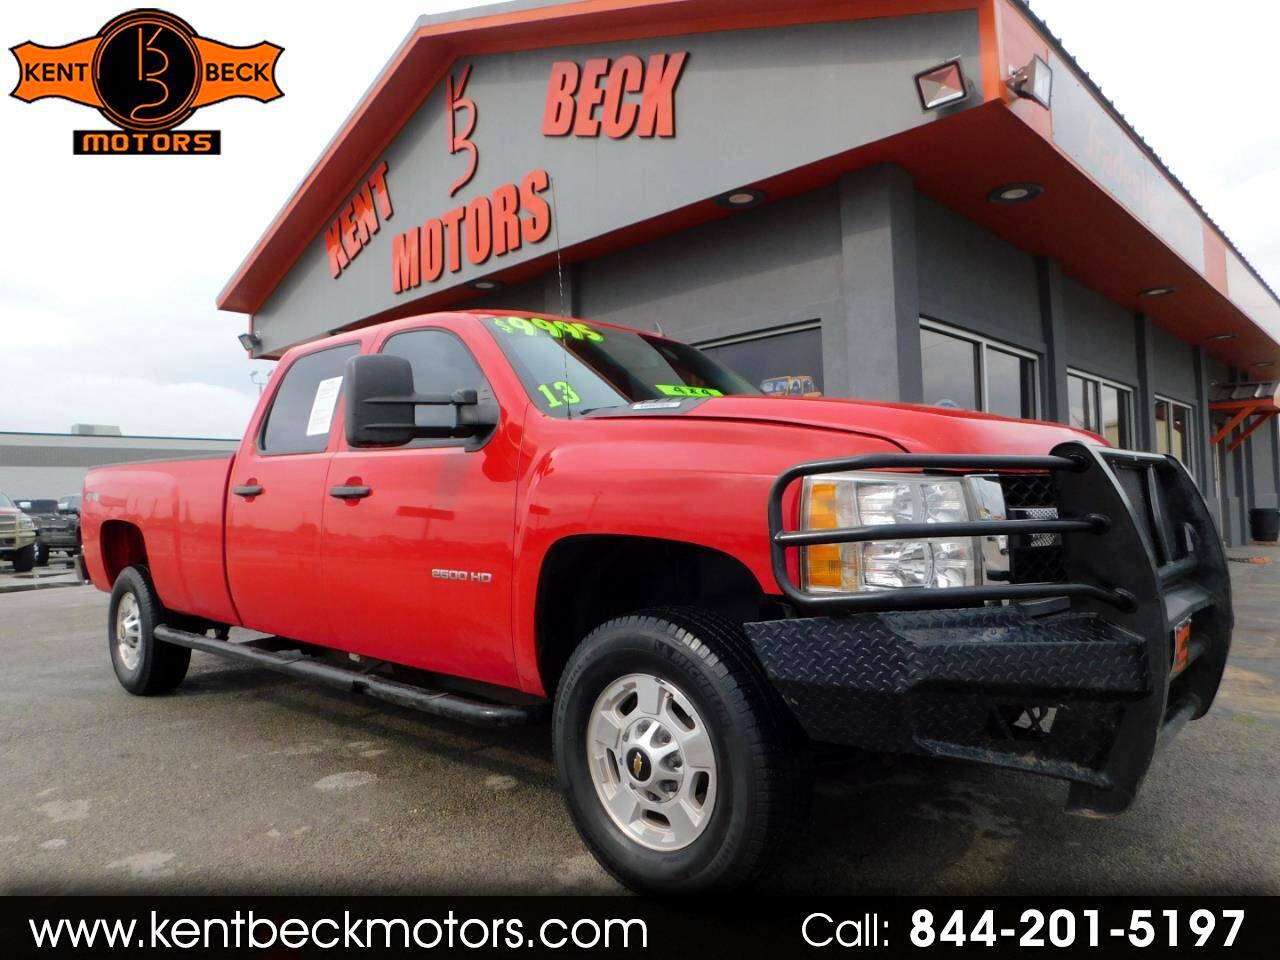 2013 Chevrolet Silverado 2500HD Work Truck Crew Cab Long Box 4WD